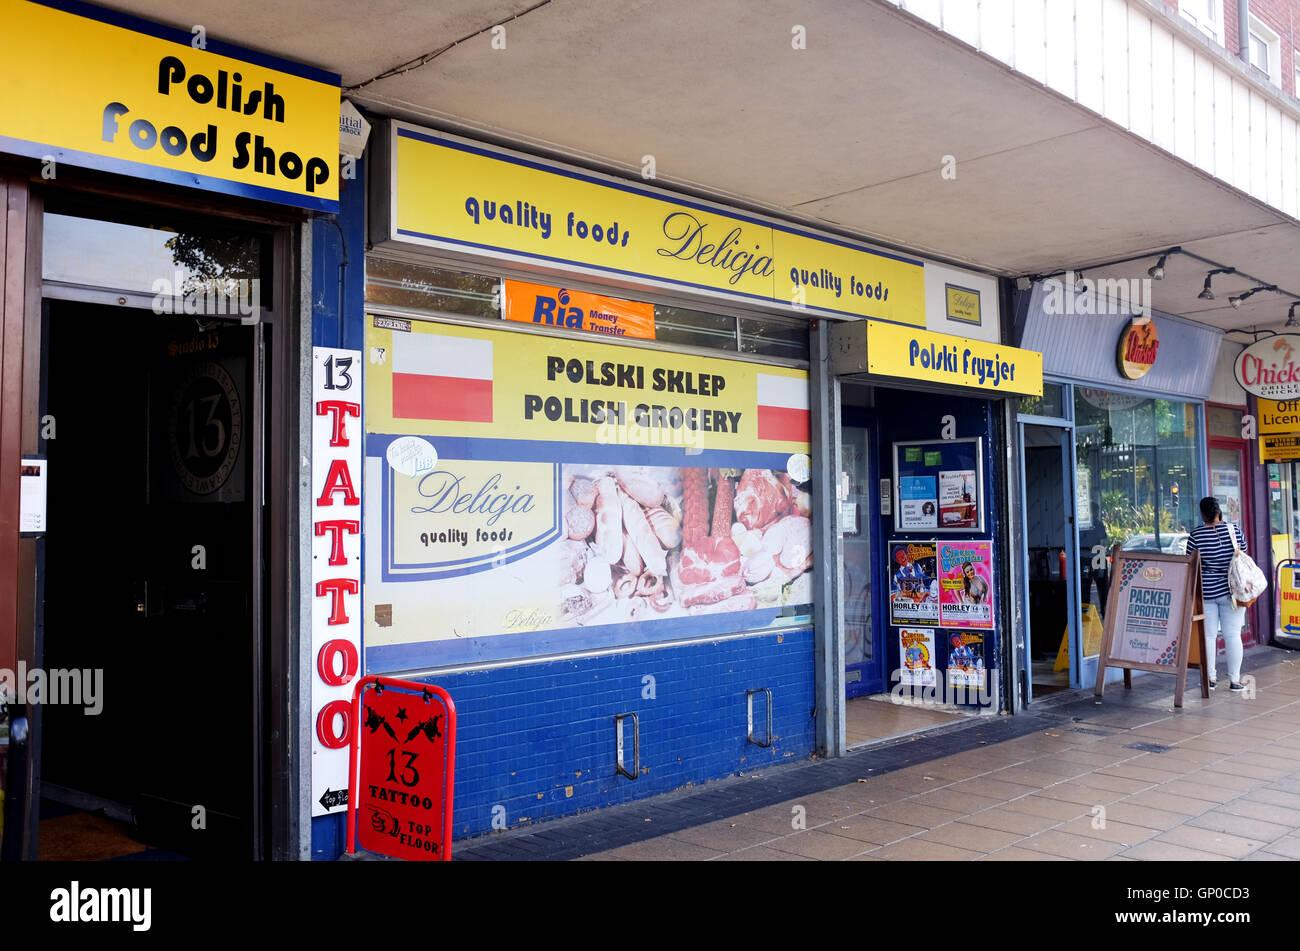 bab88312eeb59 Polski Sklep Polish Grocery Foods store in Crawley West Sussex UK - Stock  Image